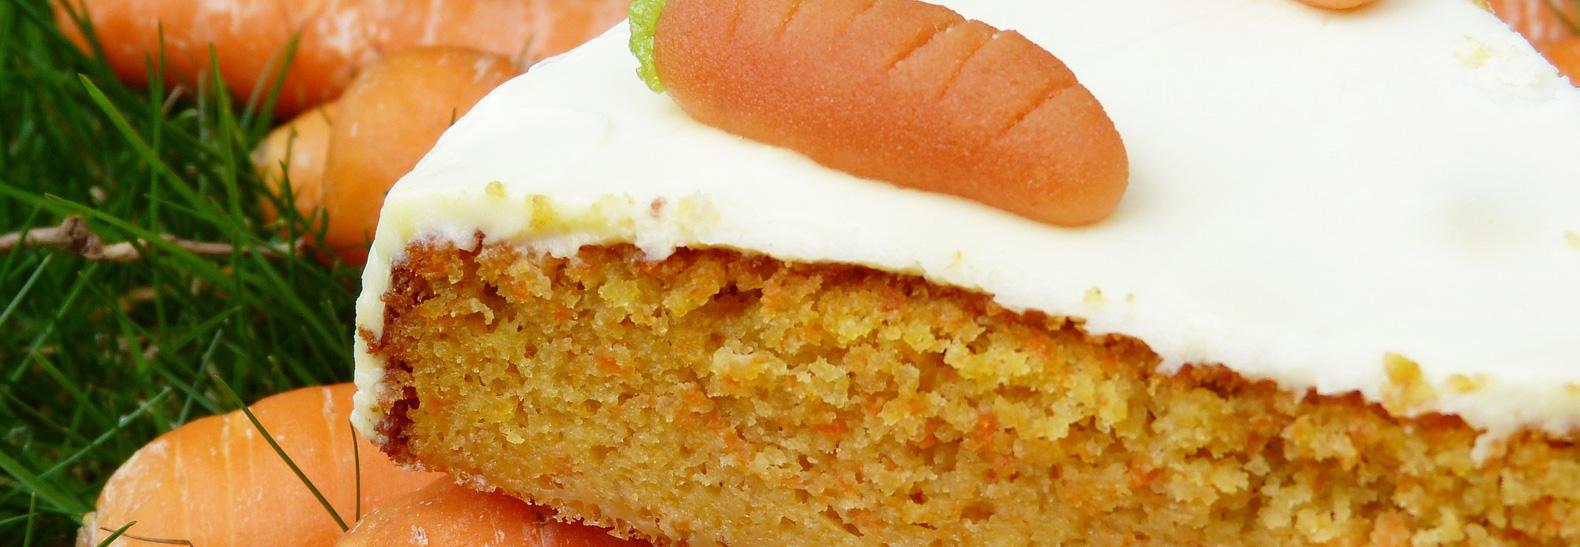 torta vegana carote